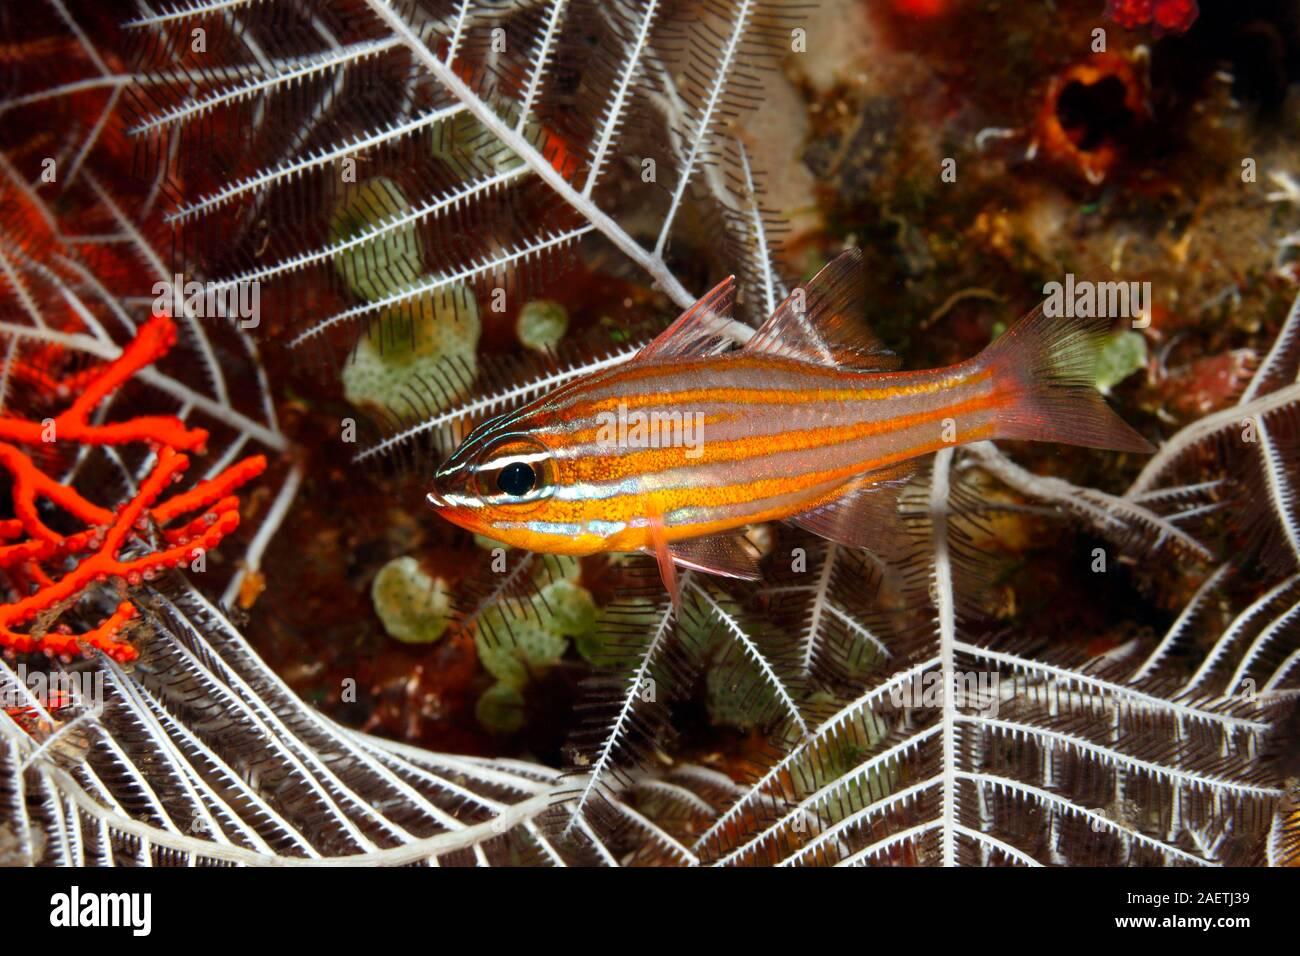 yellowstriped-cardinalfish-ostorhinchus-cyanosoma-previously-apogon-cyanosomatulamben-bali-indonesia-bali-sea-indian-ocean-2AETJ39.jpg